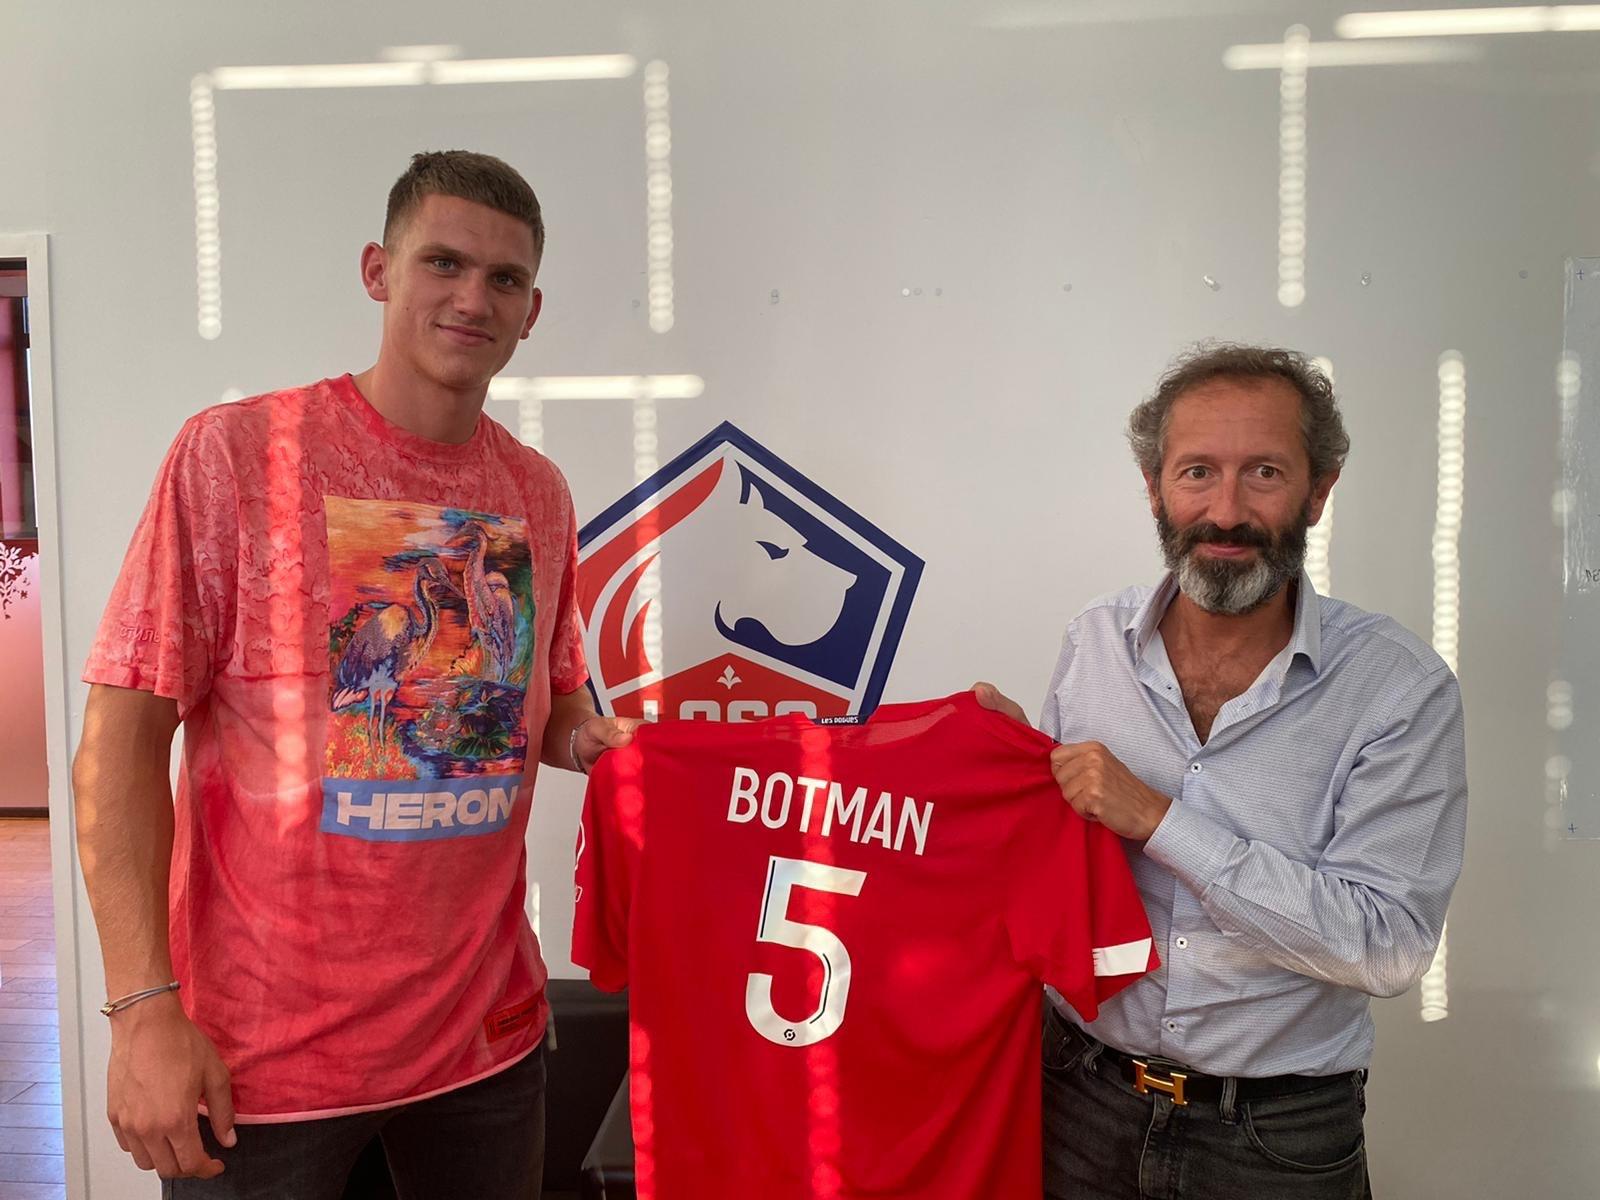 Botman1.jpg